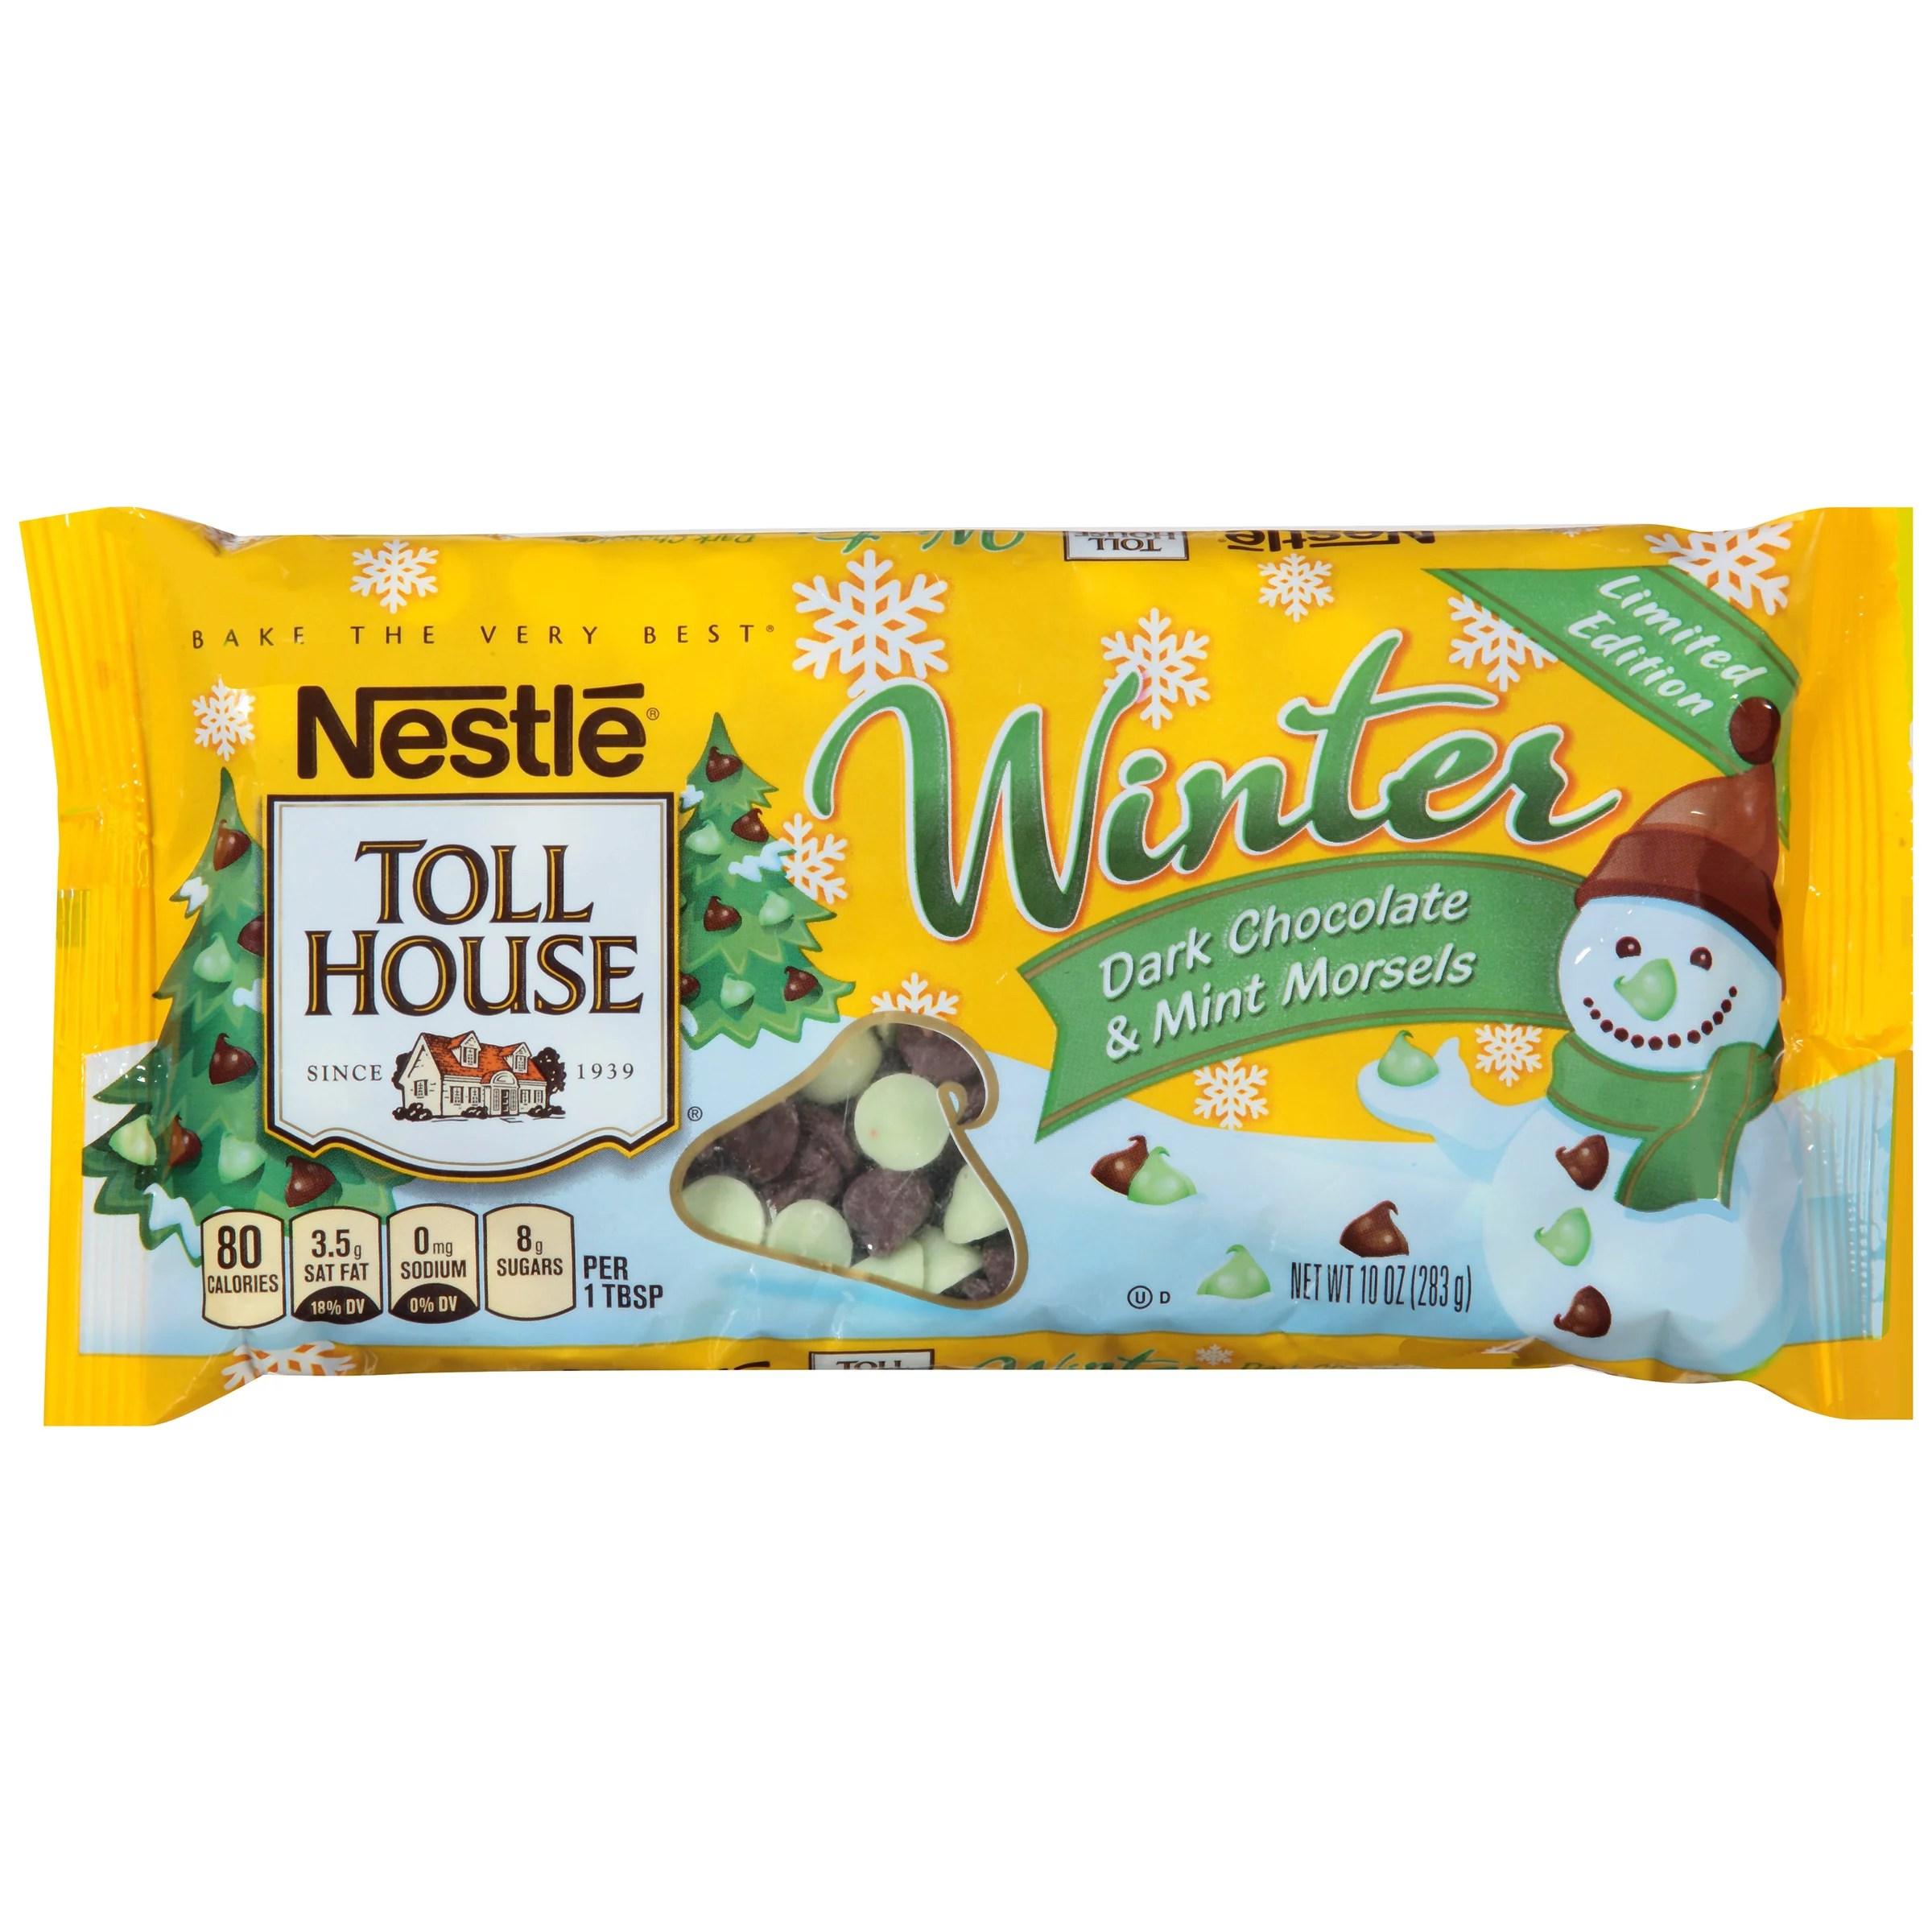 NESTLE TOLL HOUSE Winter Dark Chocolate Mint Morsels 10